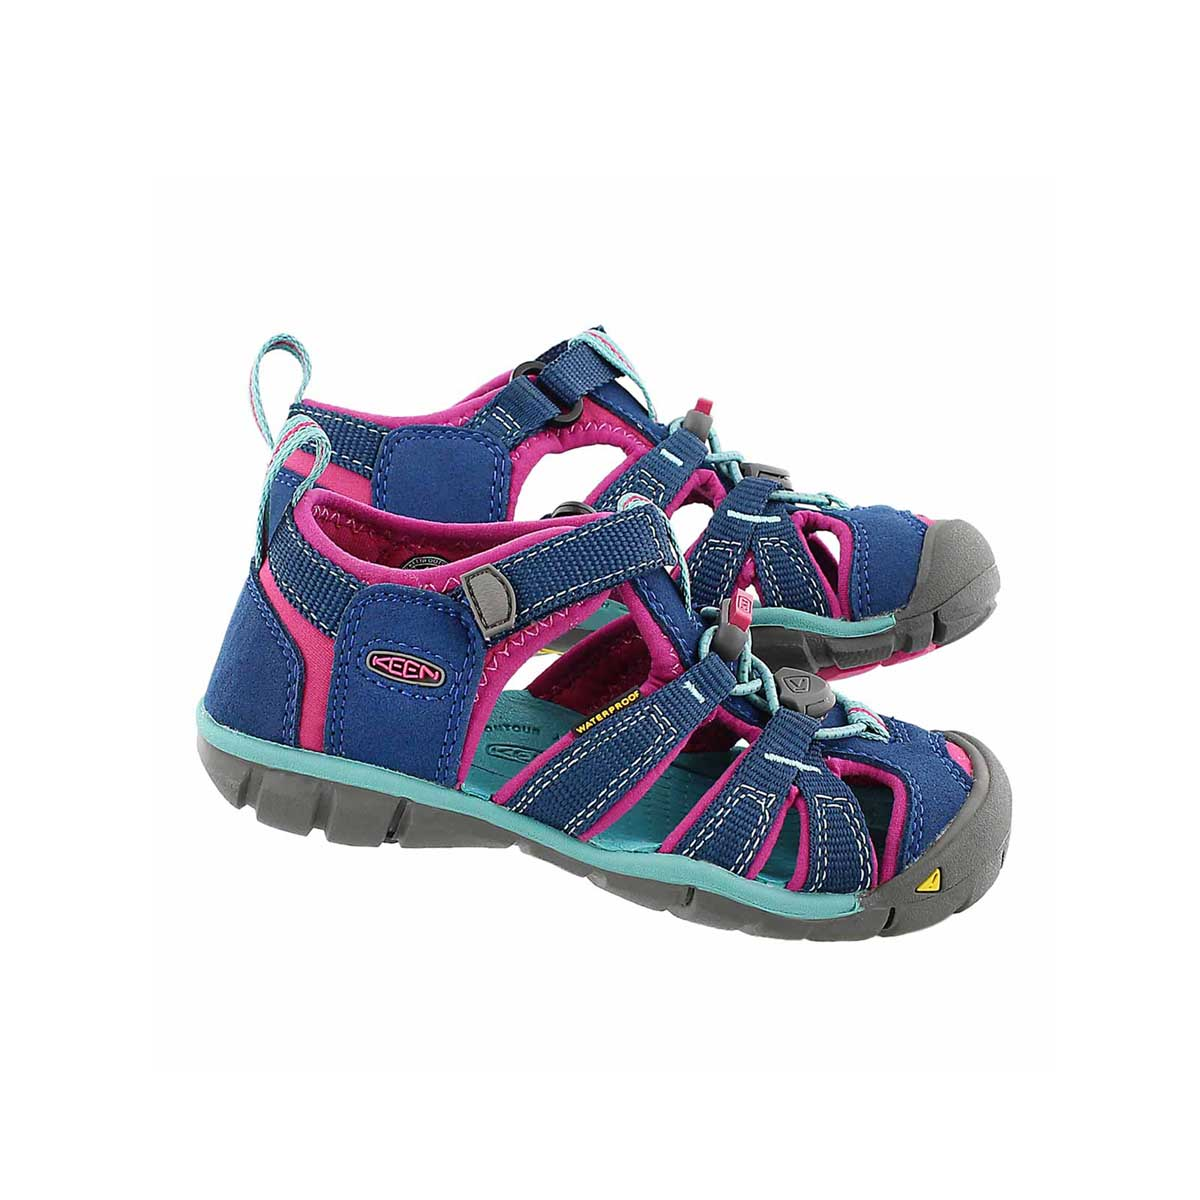 Infs-g Seacamp lI nvy/berry sport sandal